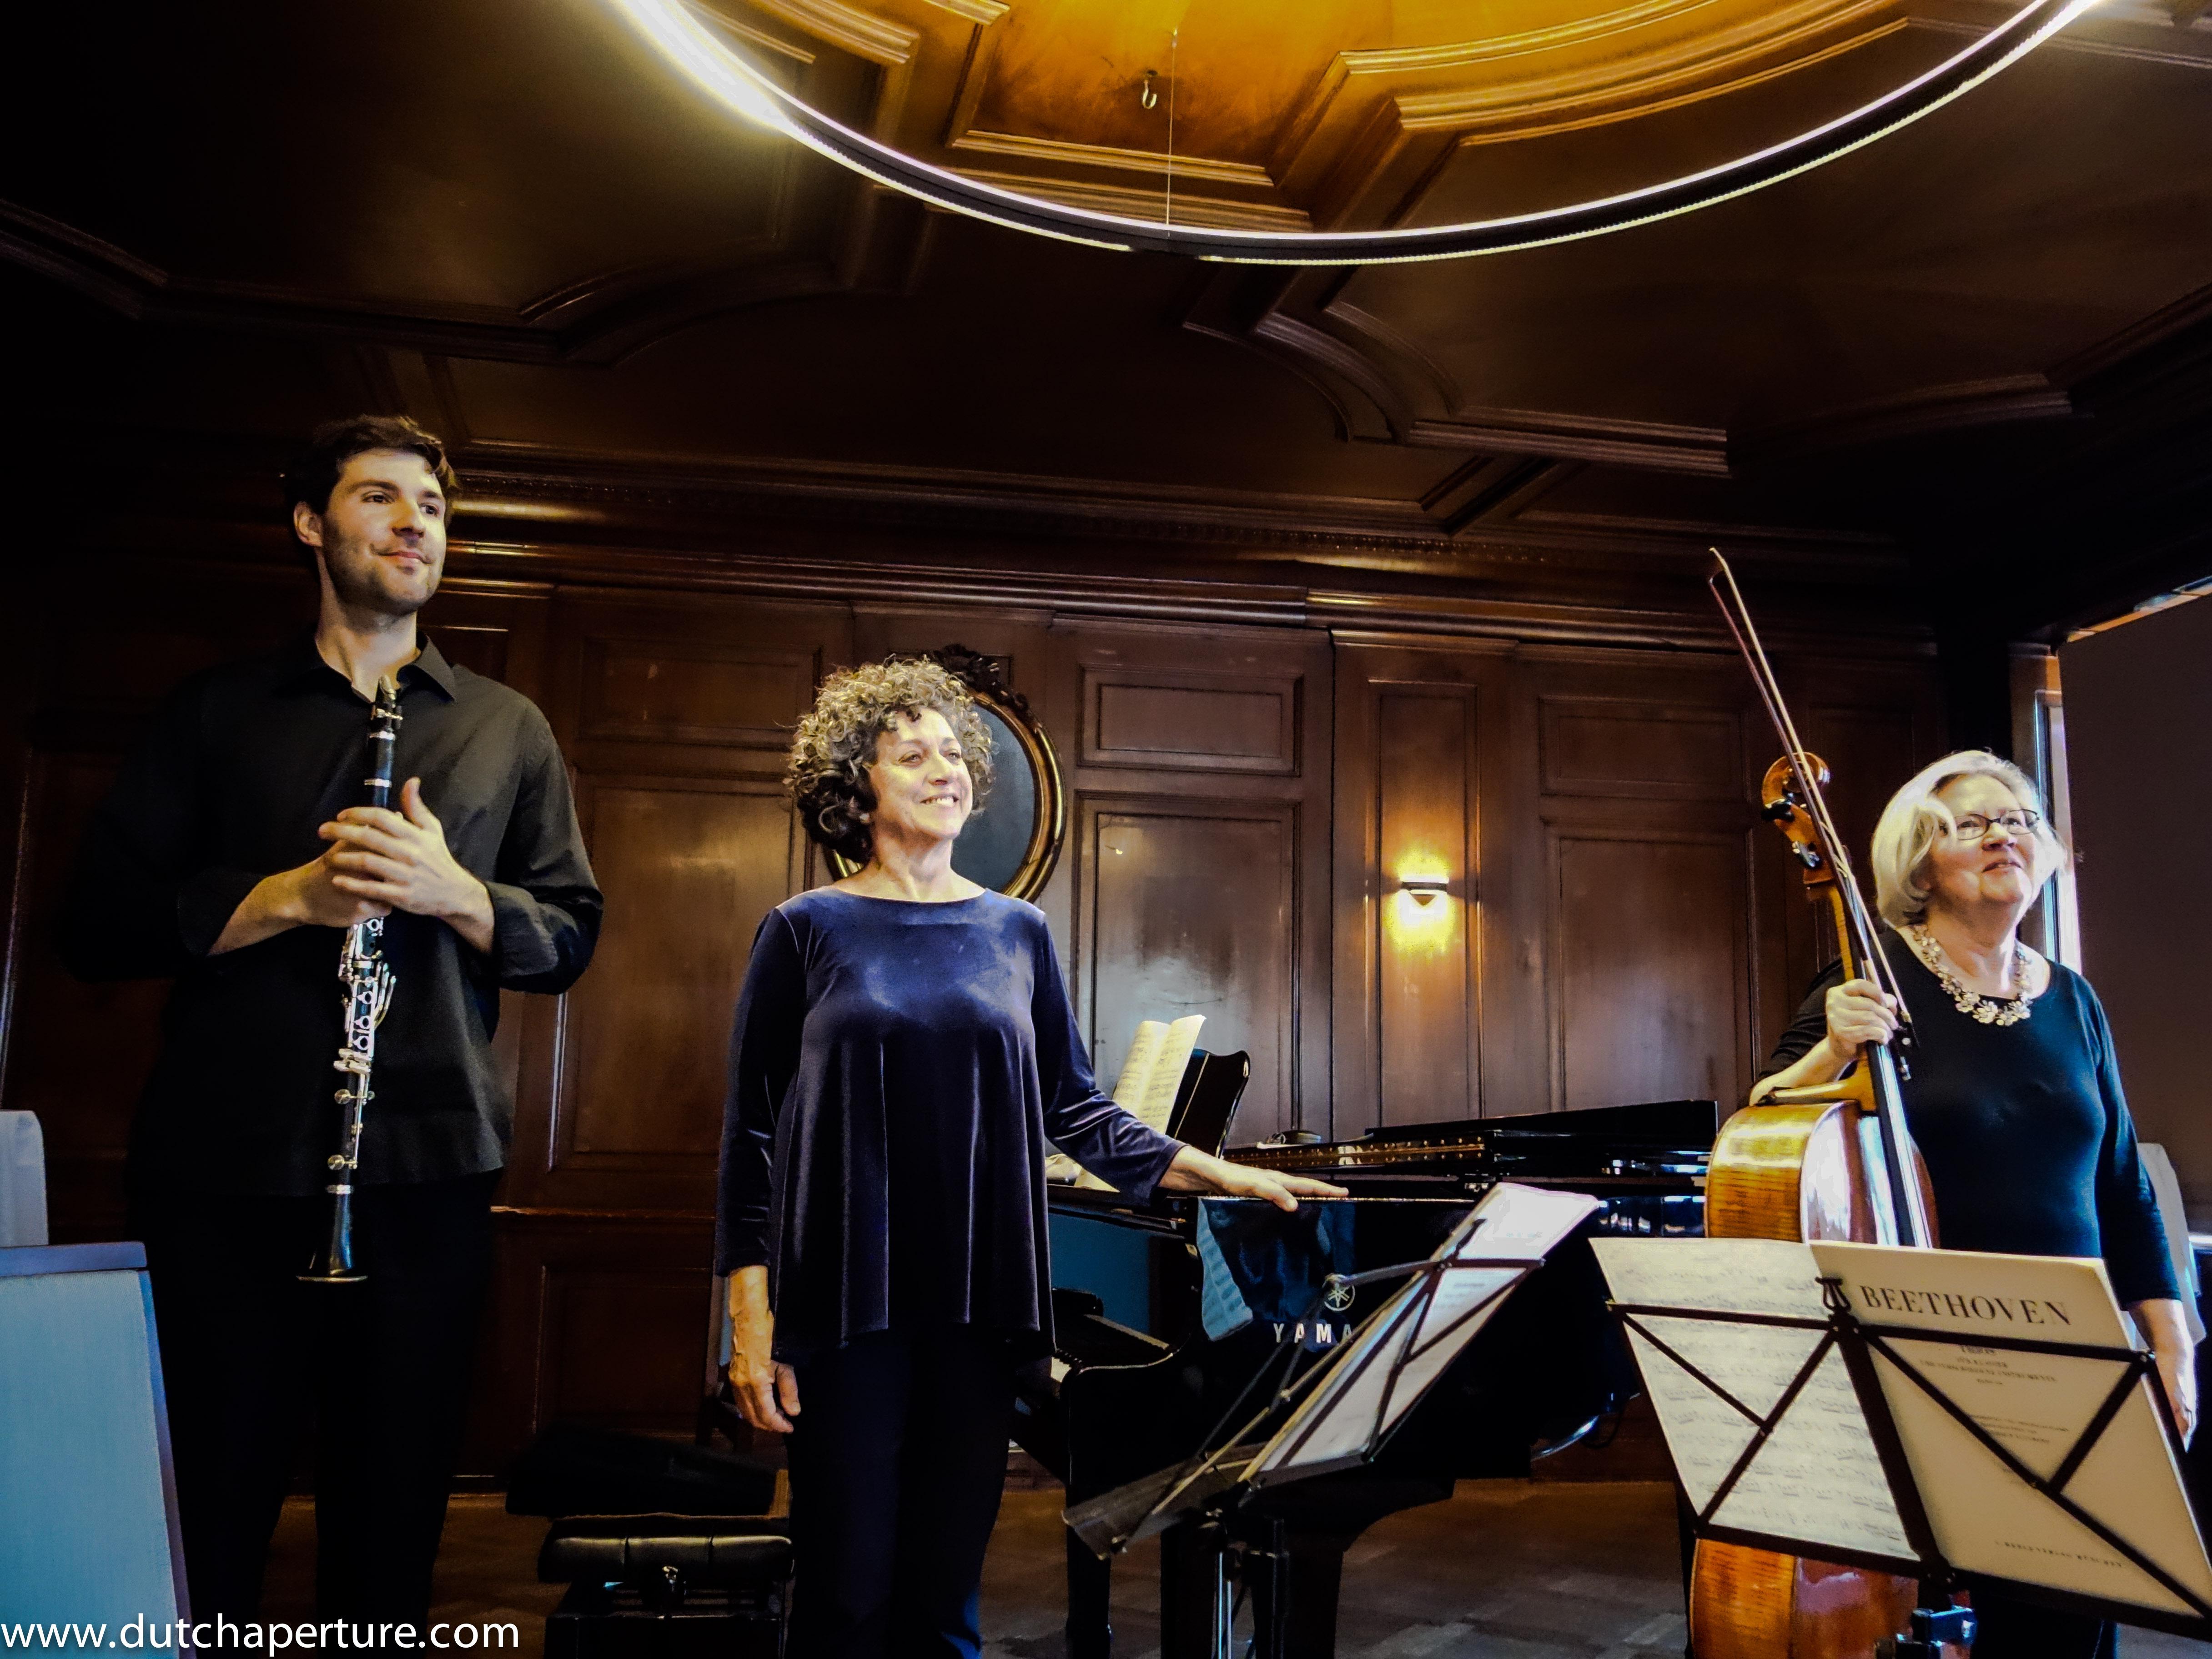 Bilder Concert Ayadin - Hopkins Marti - Hänni WP MP-18